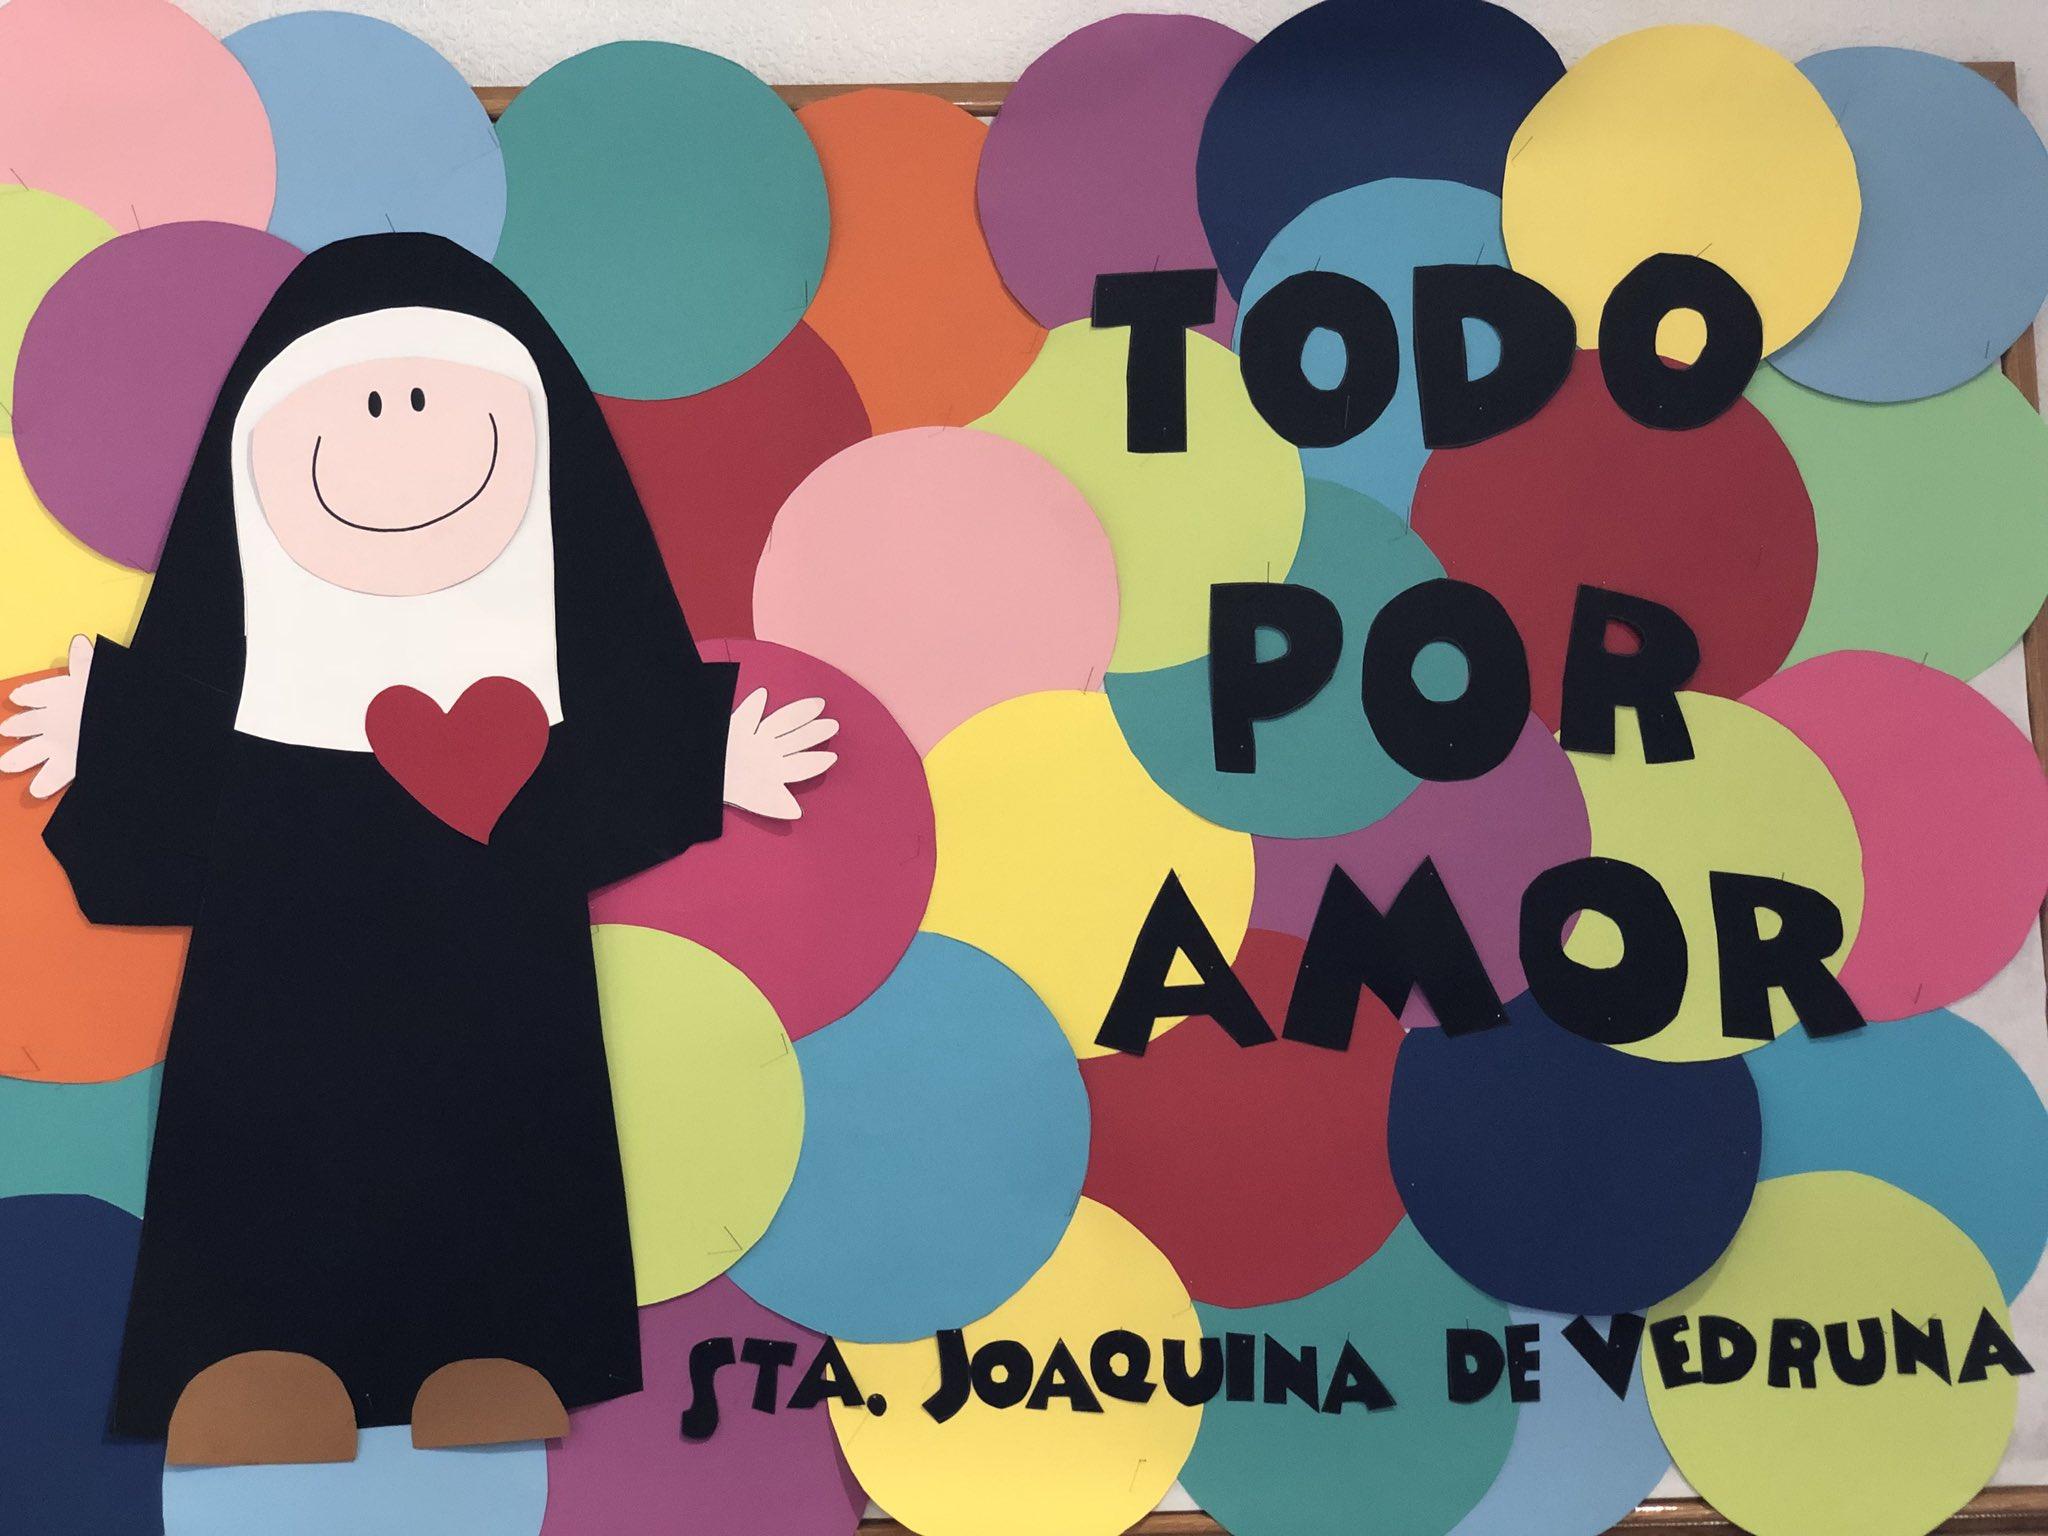 Resultado de imagen de JOAQUINA DE VEDRUNA ESPAÃ'OL